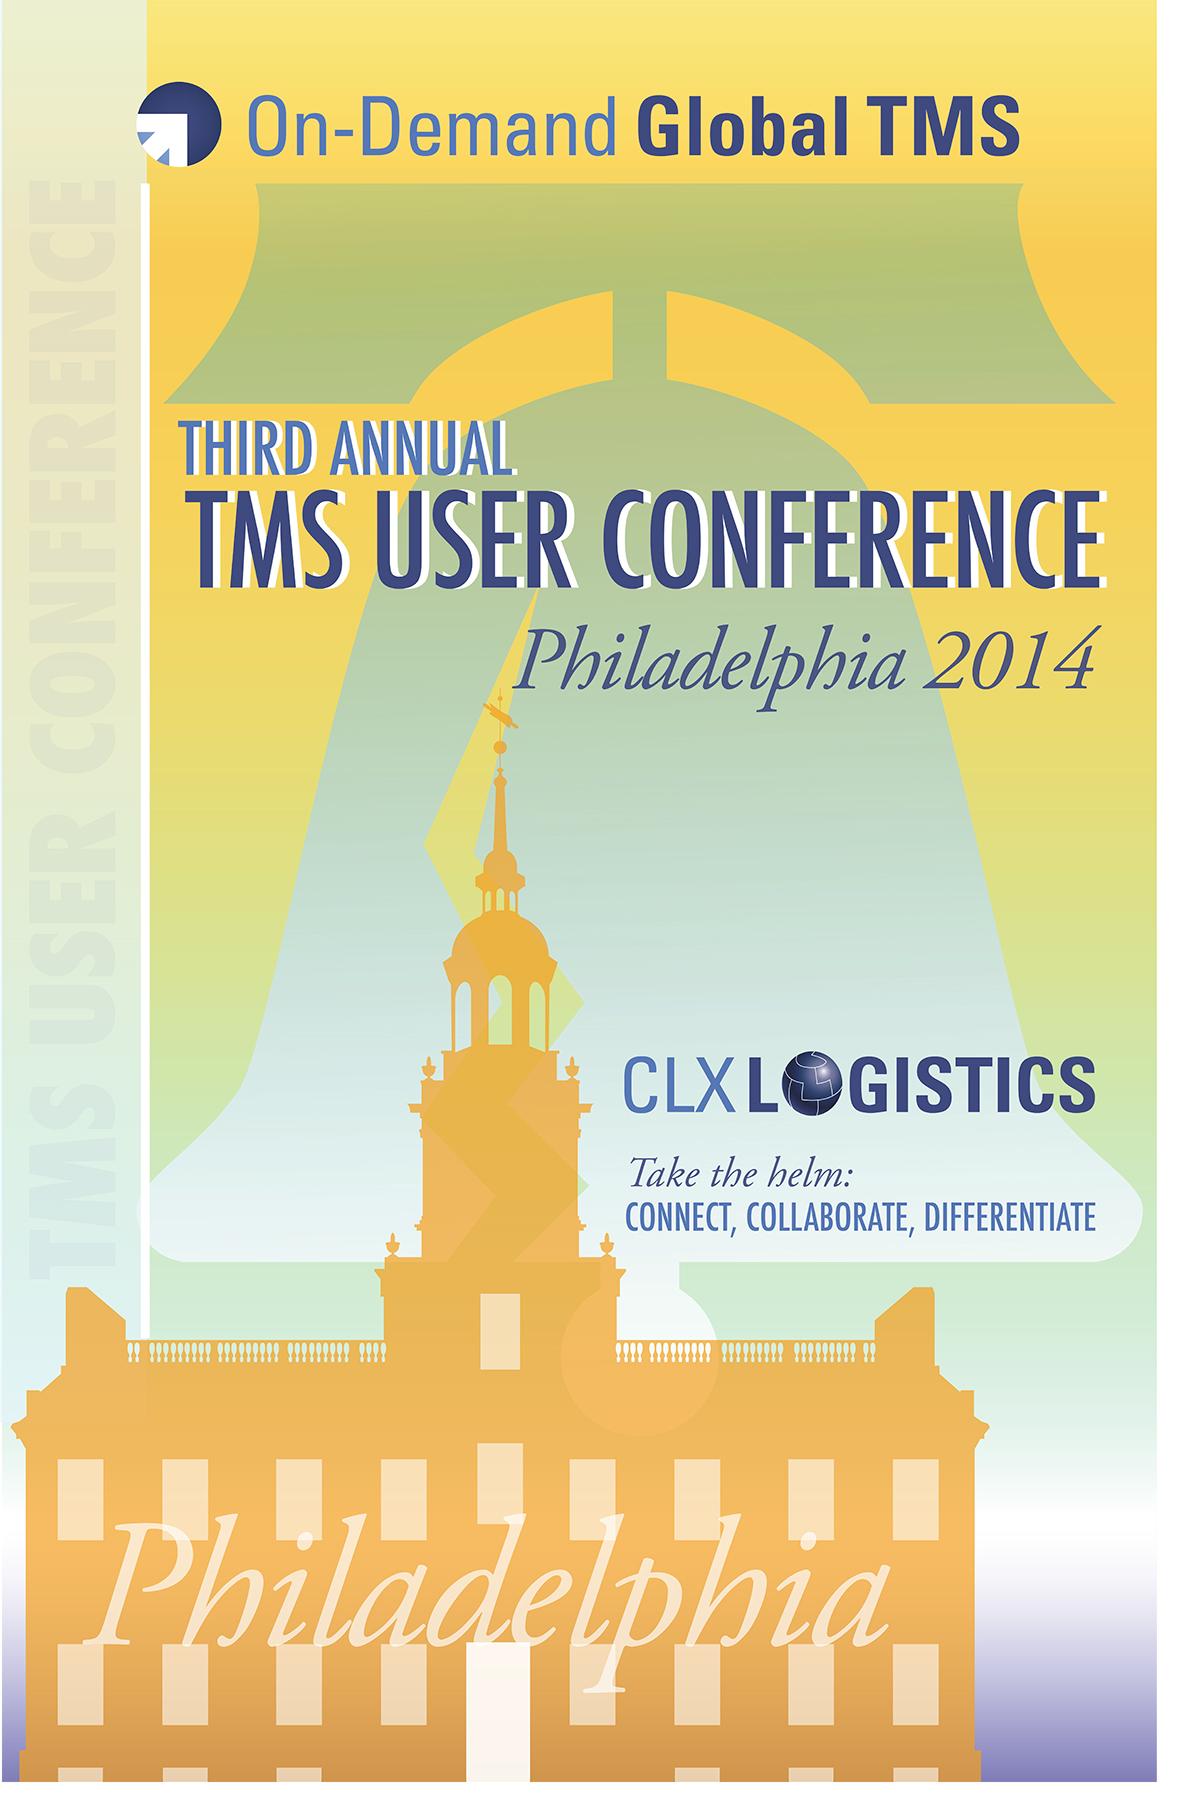 CLX Logistics Poster Design